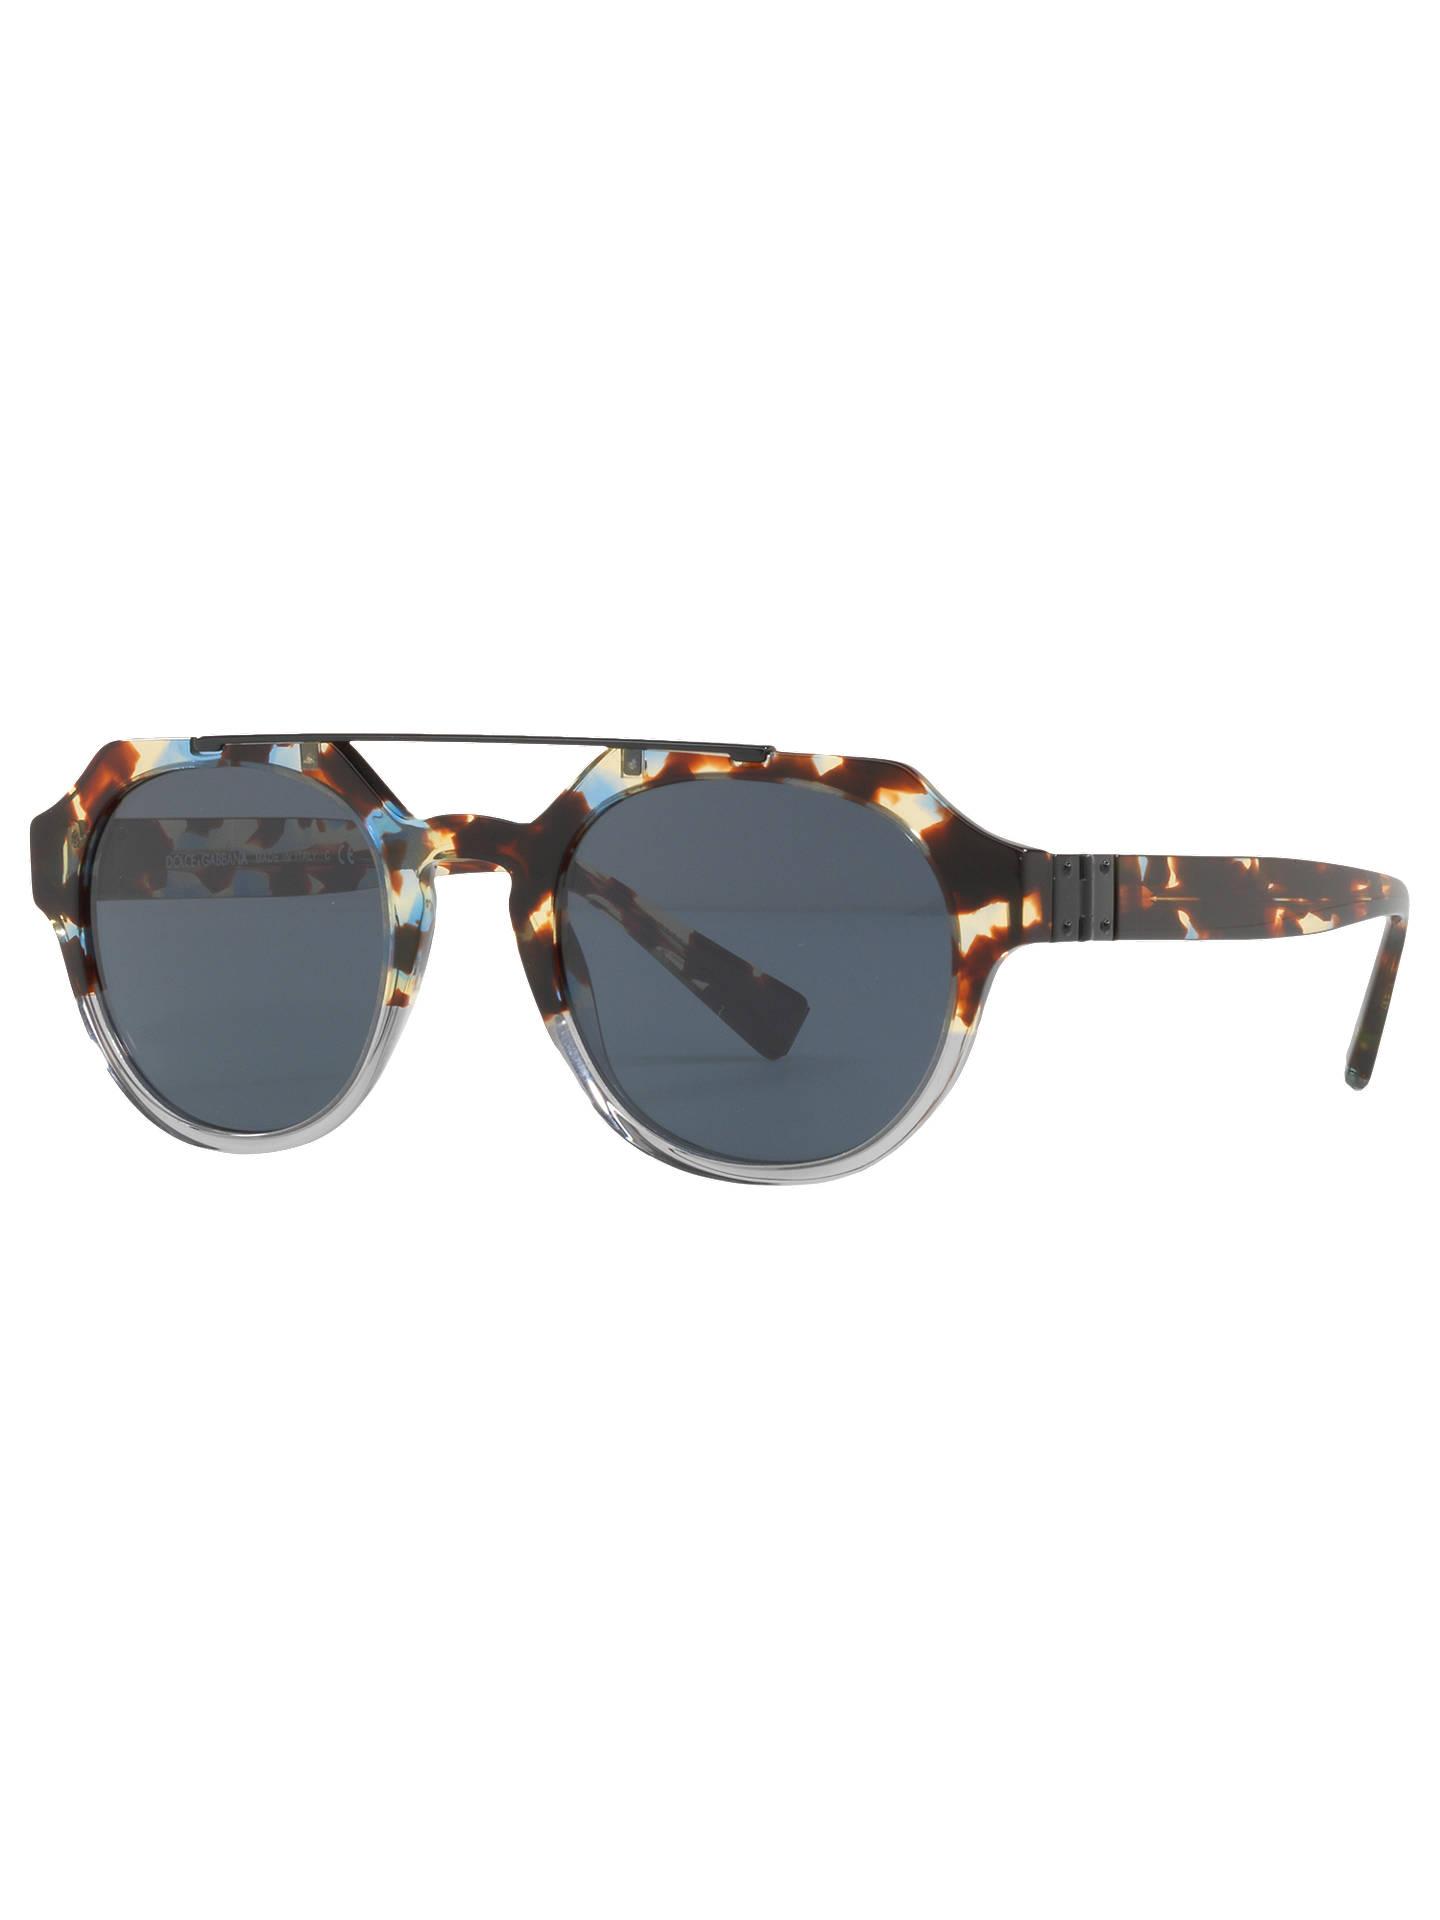 2781062682 Buy Dolce   Gabbana DG4313 Oval Sunglasses